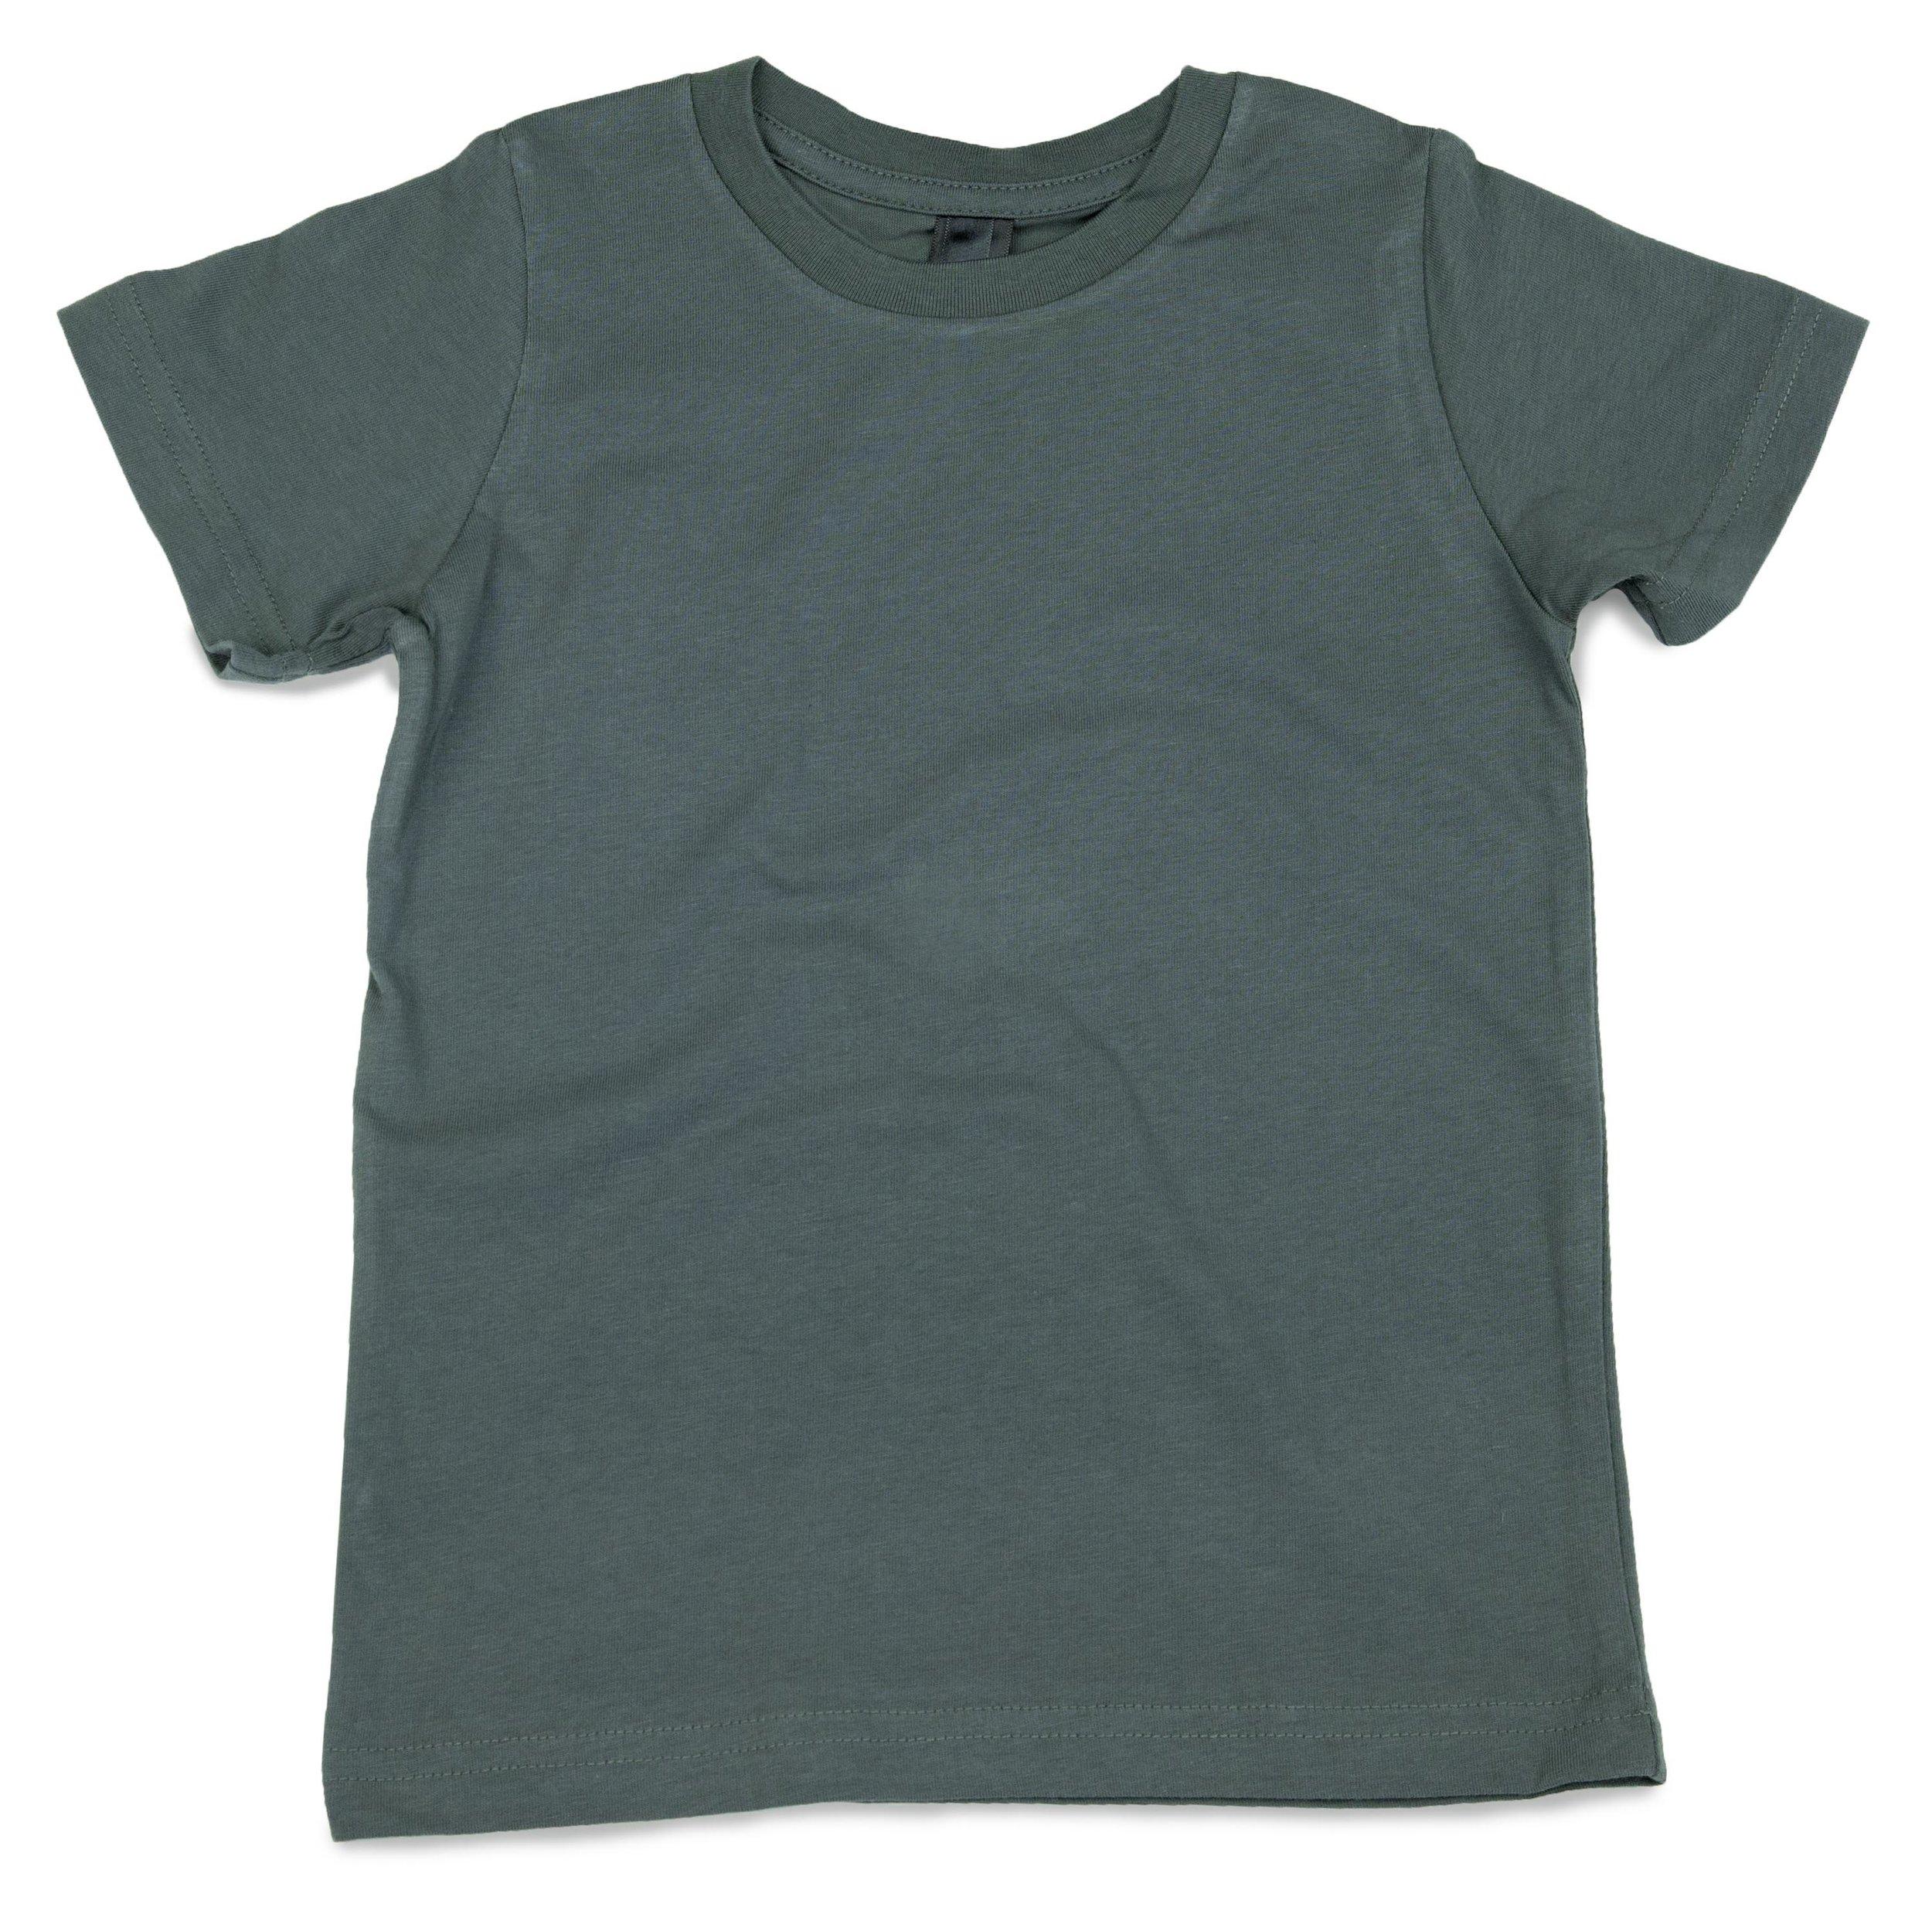 B1 - Children's T-shirt